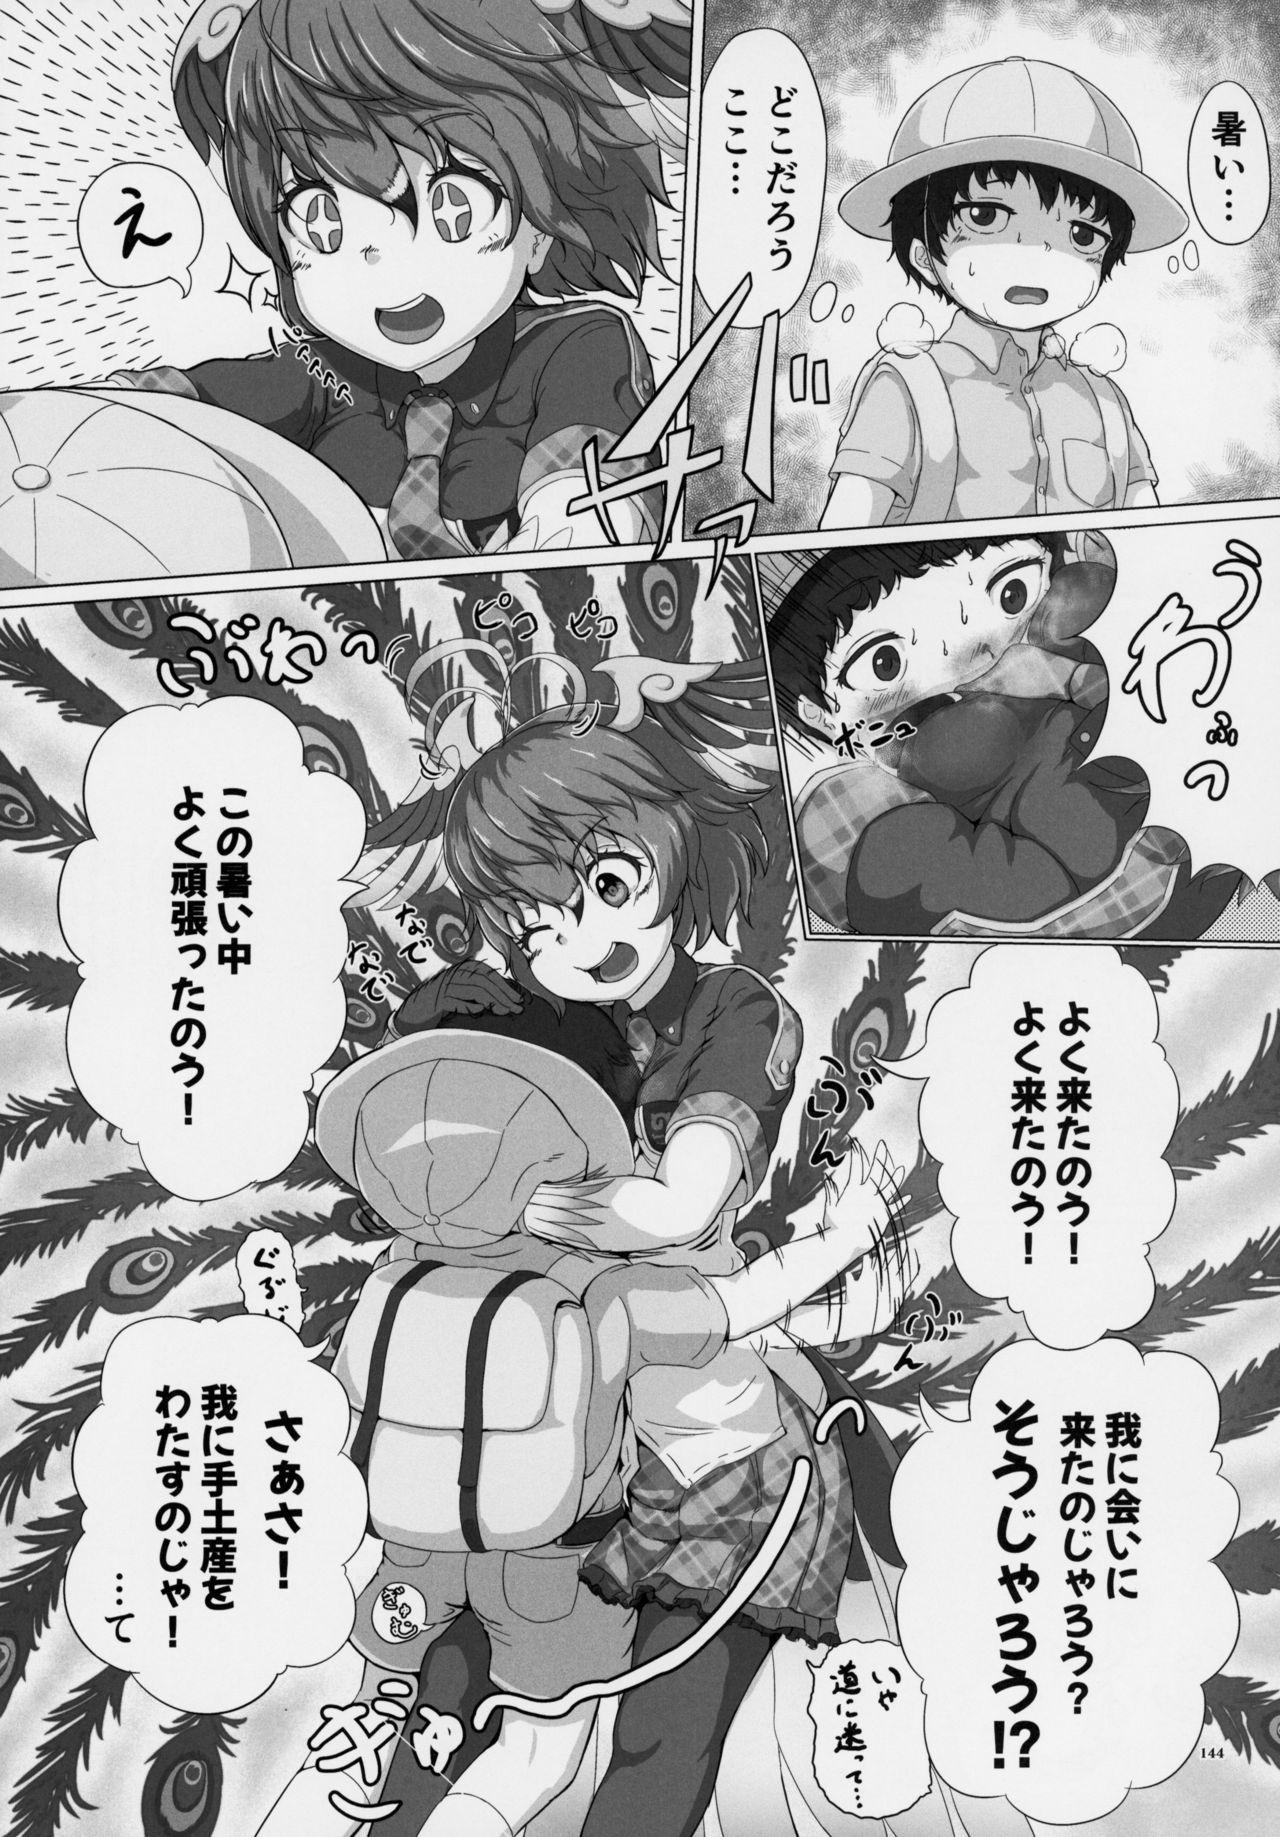 Friends Gyaku Rape Goudoushi 142